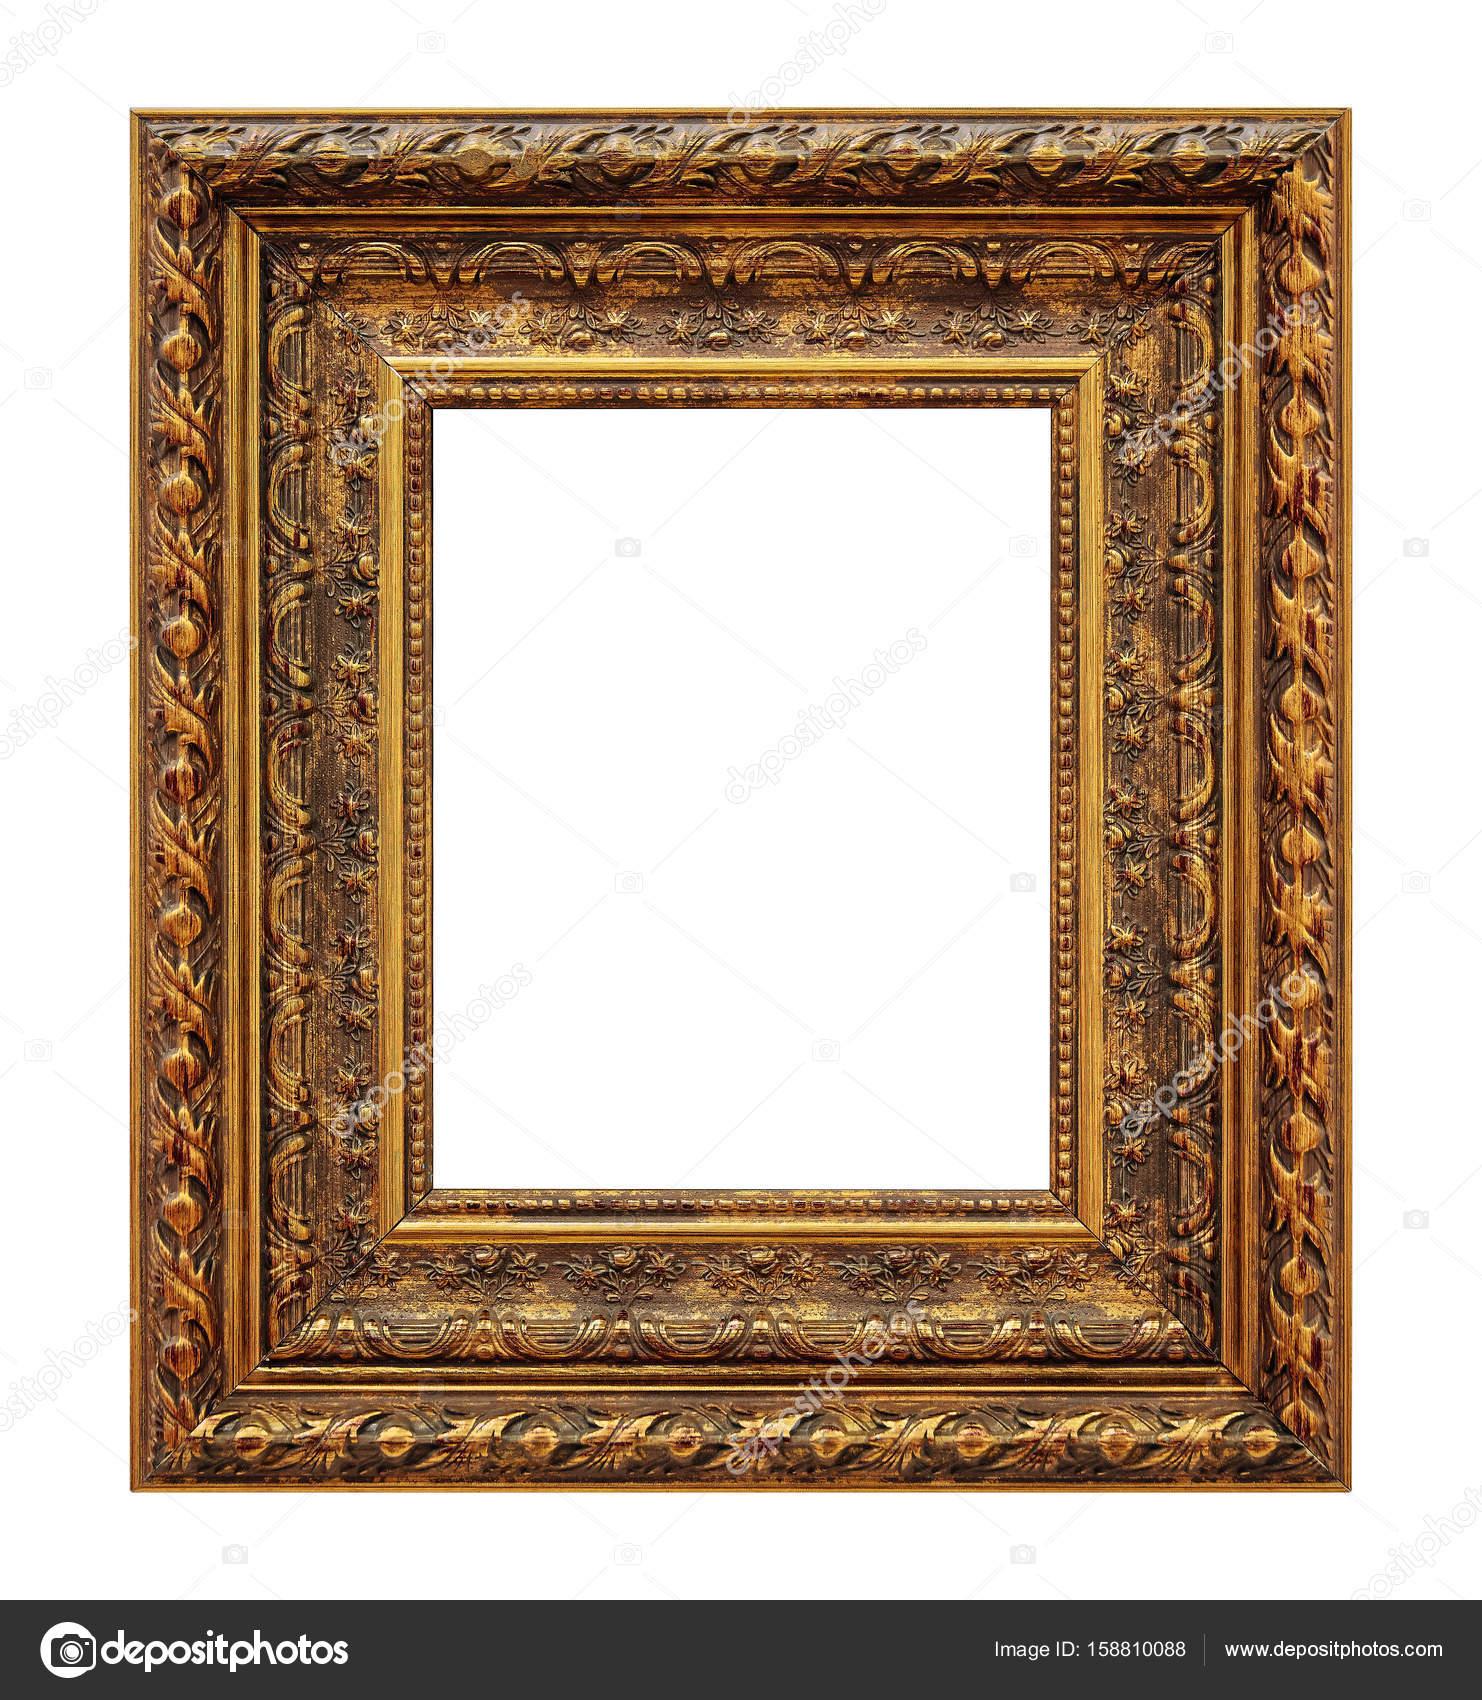 Rahmen im antiken Stil. Vintage Bilderrahmen — Stockfoto ...